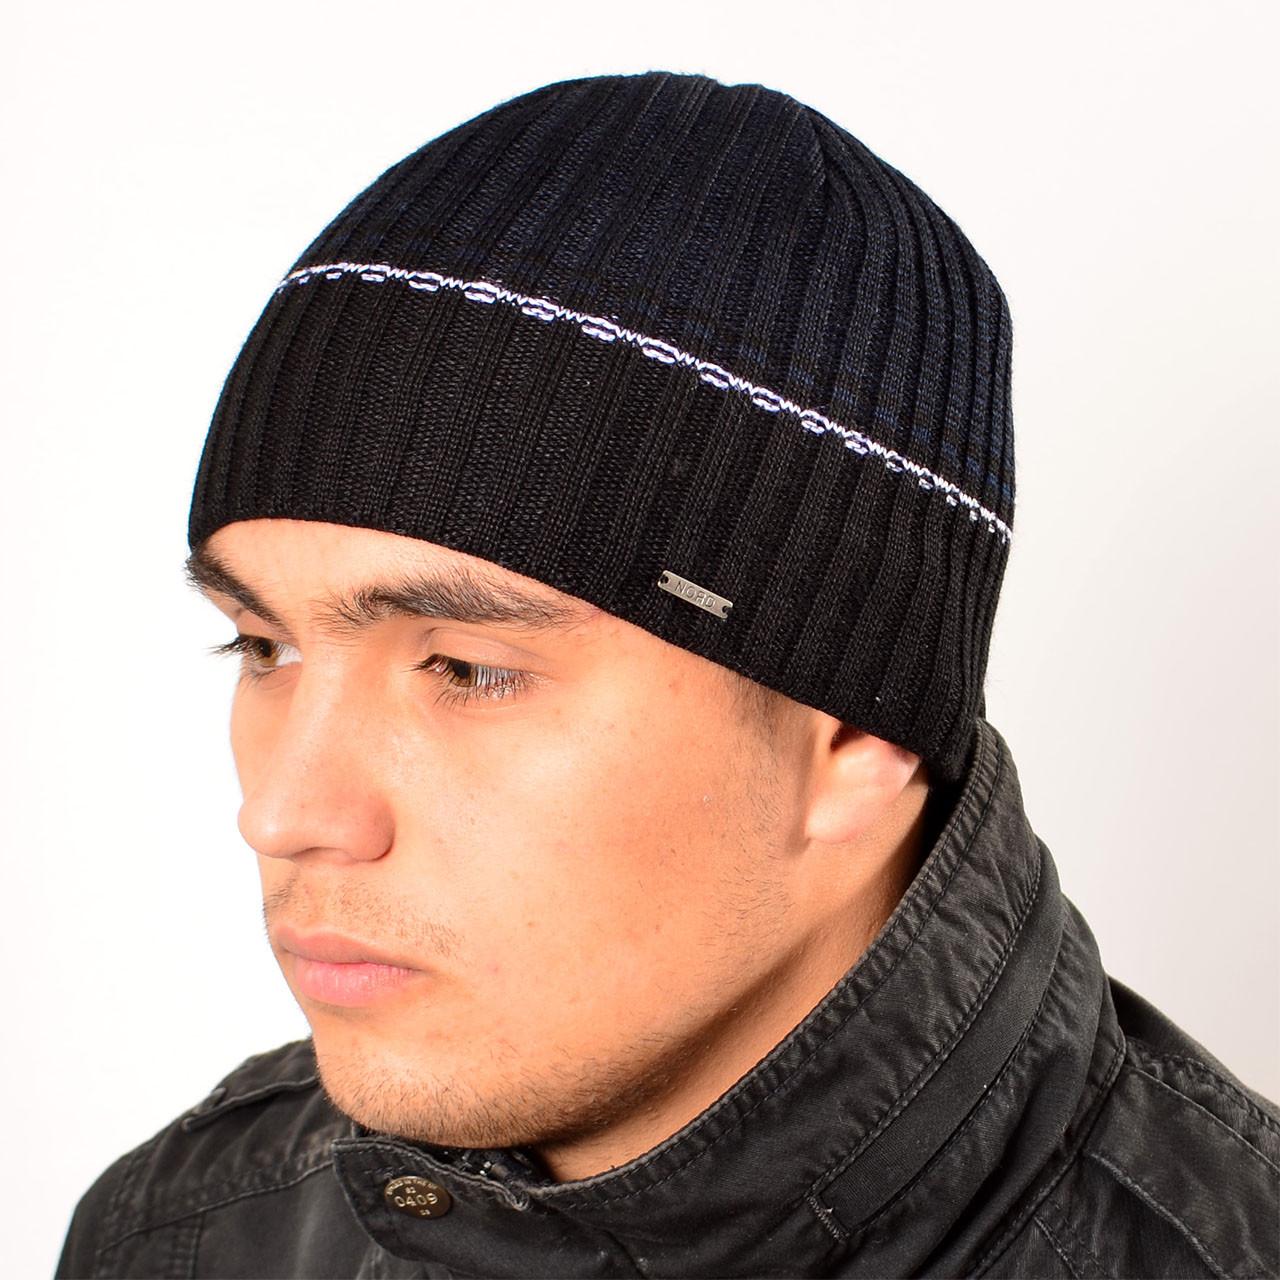 Мужская вязанная шапка на флисе, темн.джинс, Nord